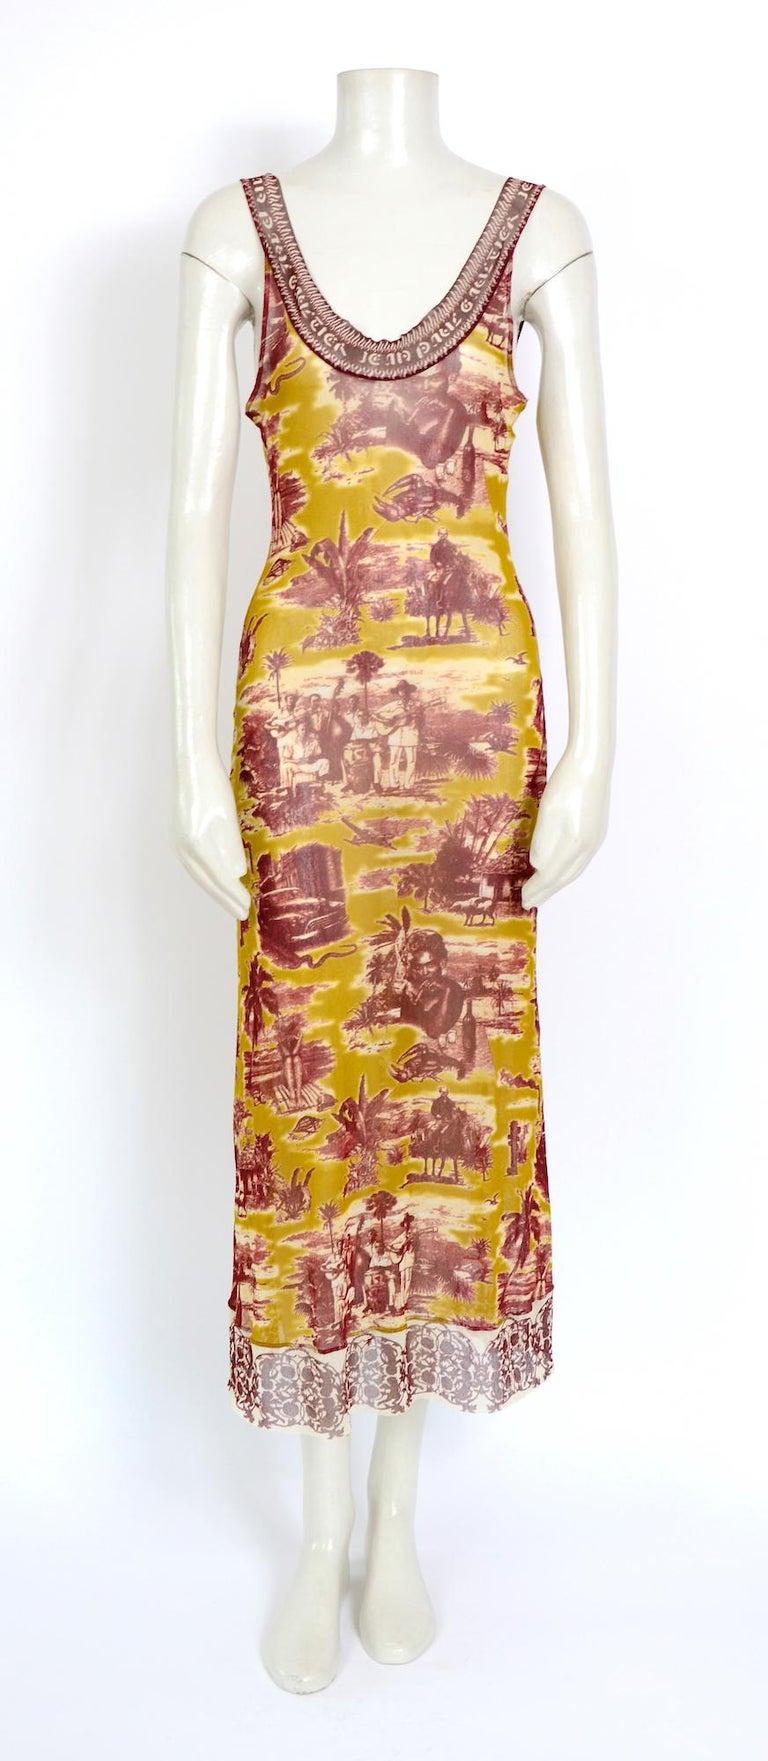 Jean Paul Gaultier classique vintage 1990s cuba print + nude mesh slip dresses  For Sale 2